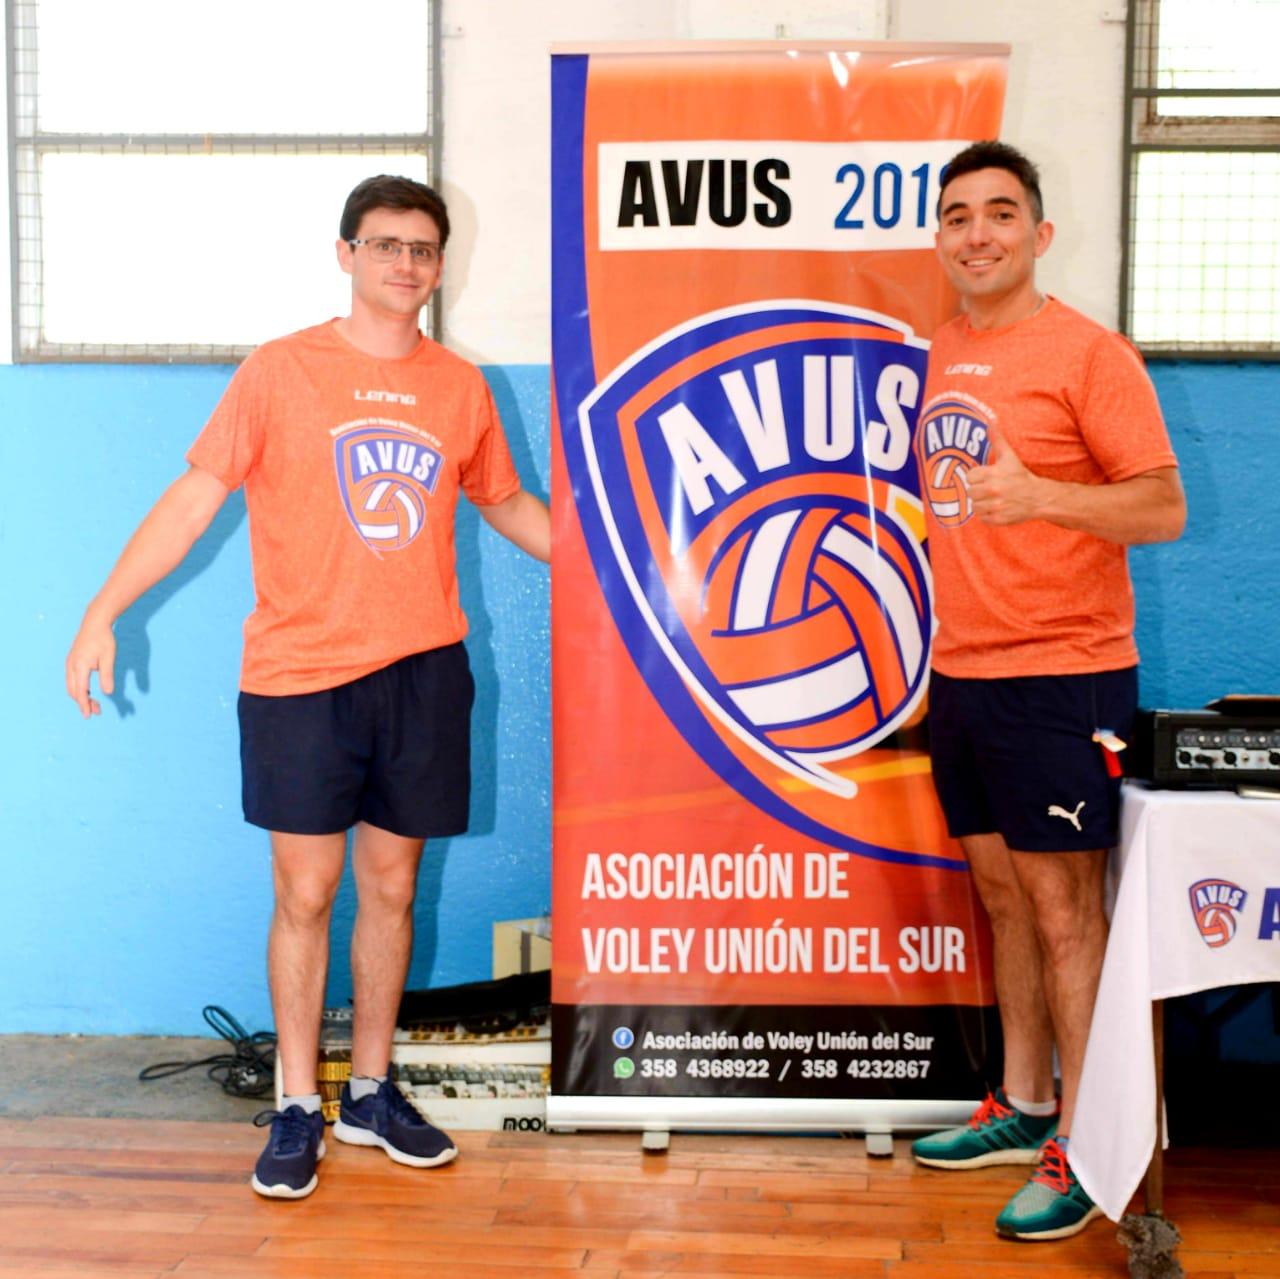 Julio Rivoira (derecha), presidente de AVUS junto al secretario de la entidad, Ronaldo Falcón (izquierda).